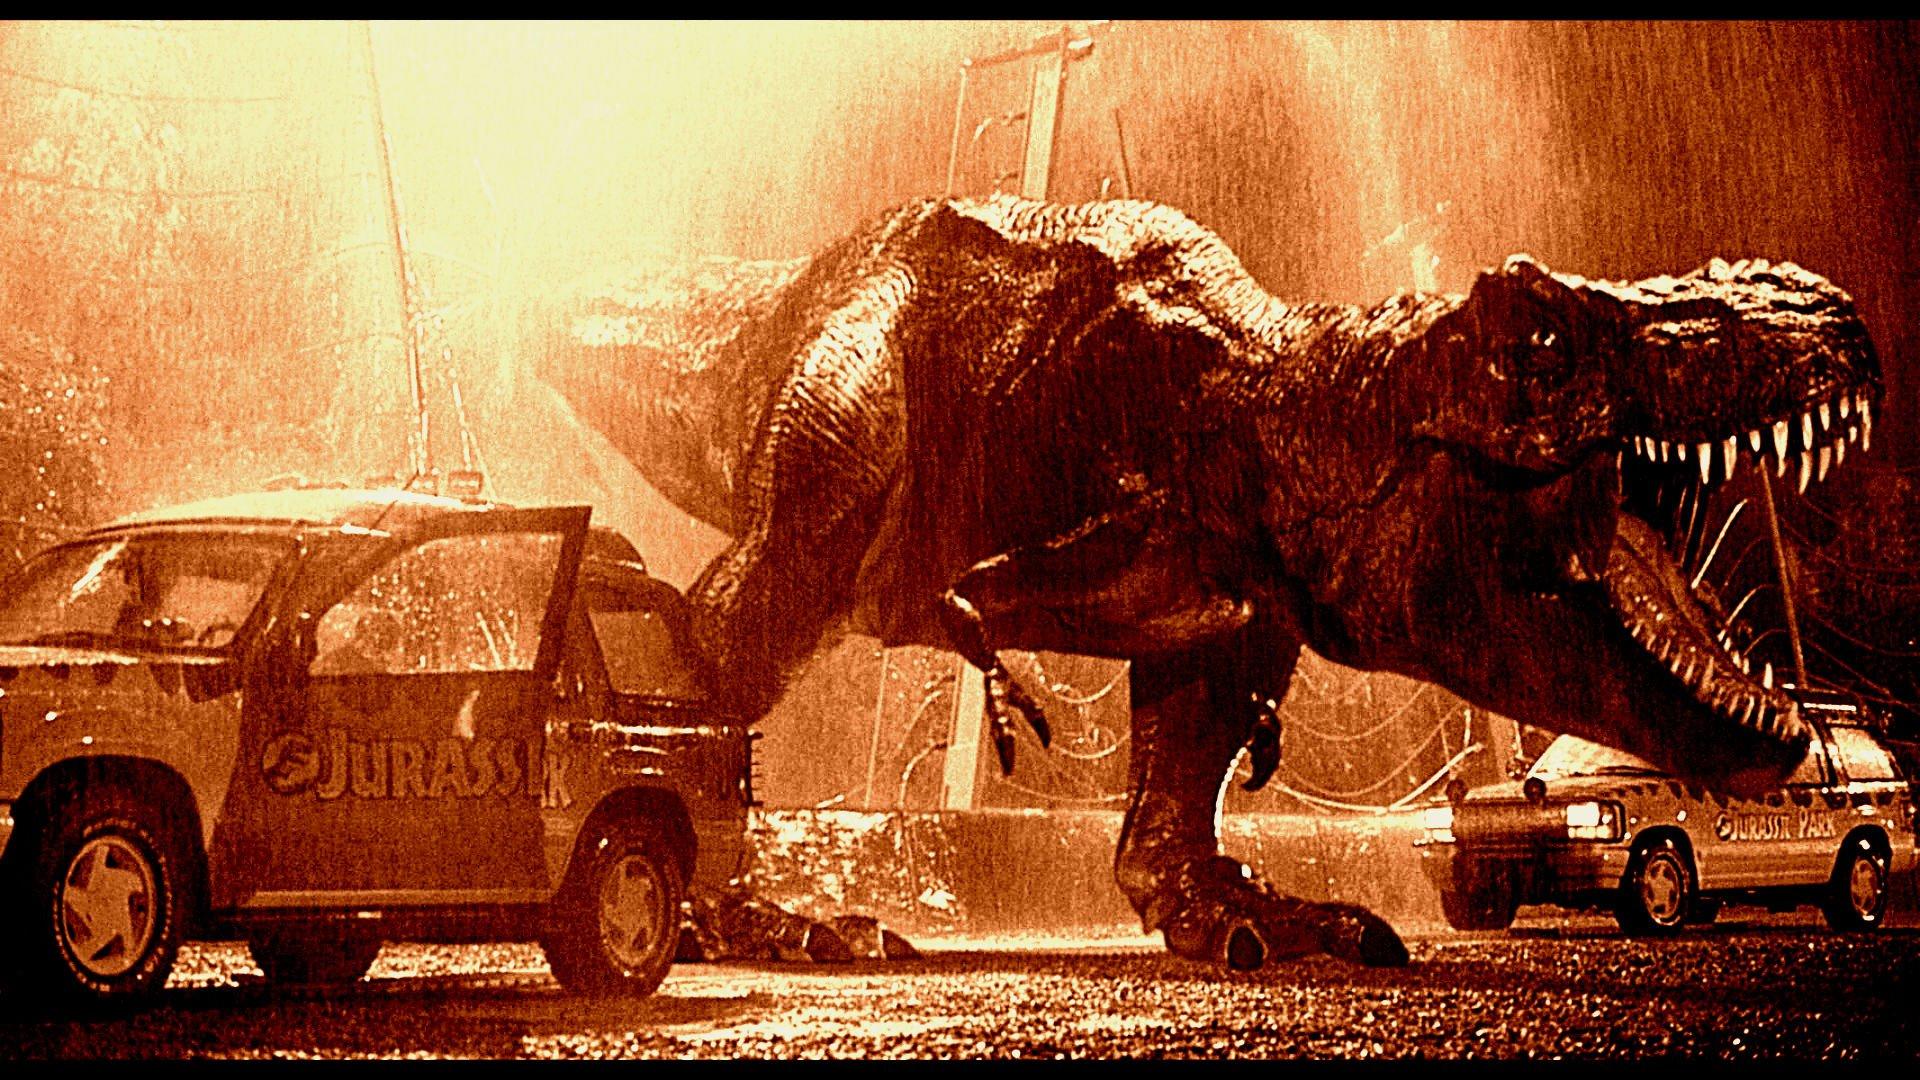 Jurassic Park Wallpaper (50 Wallpapers) - Adorable Wallpapers